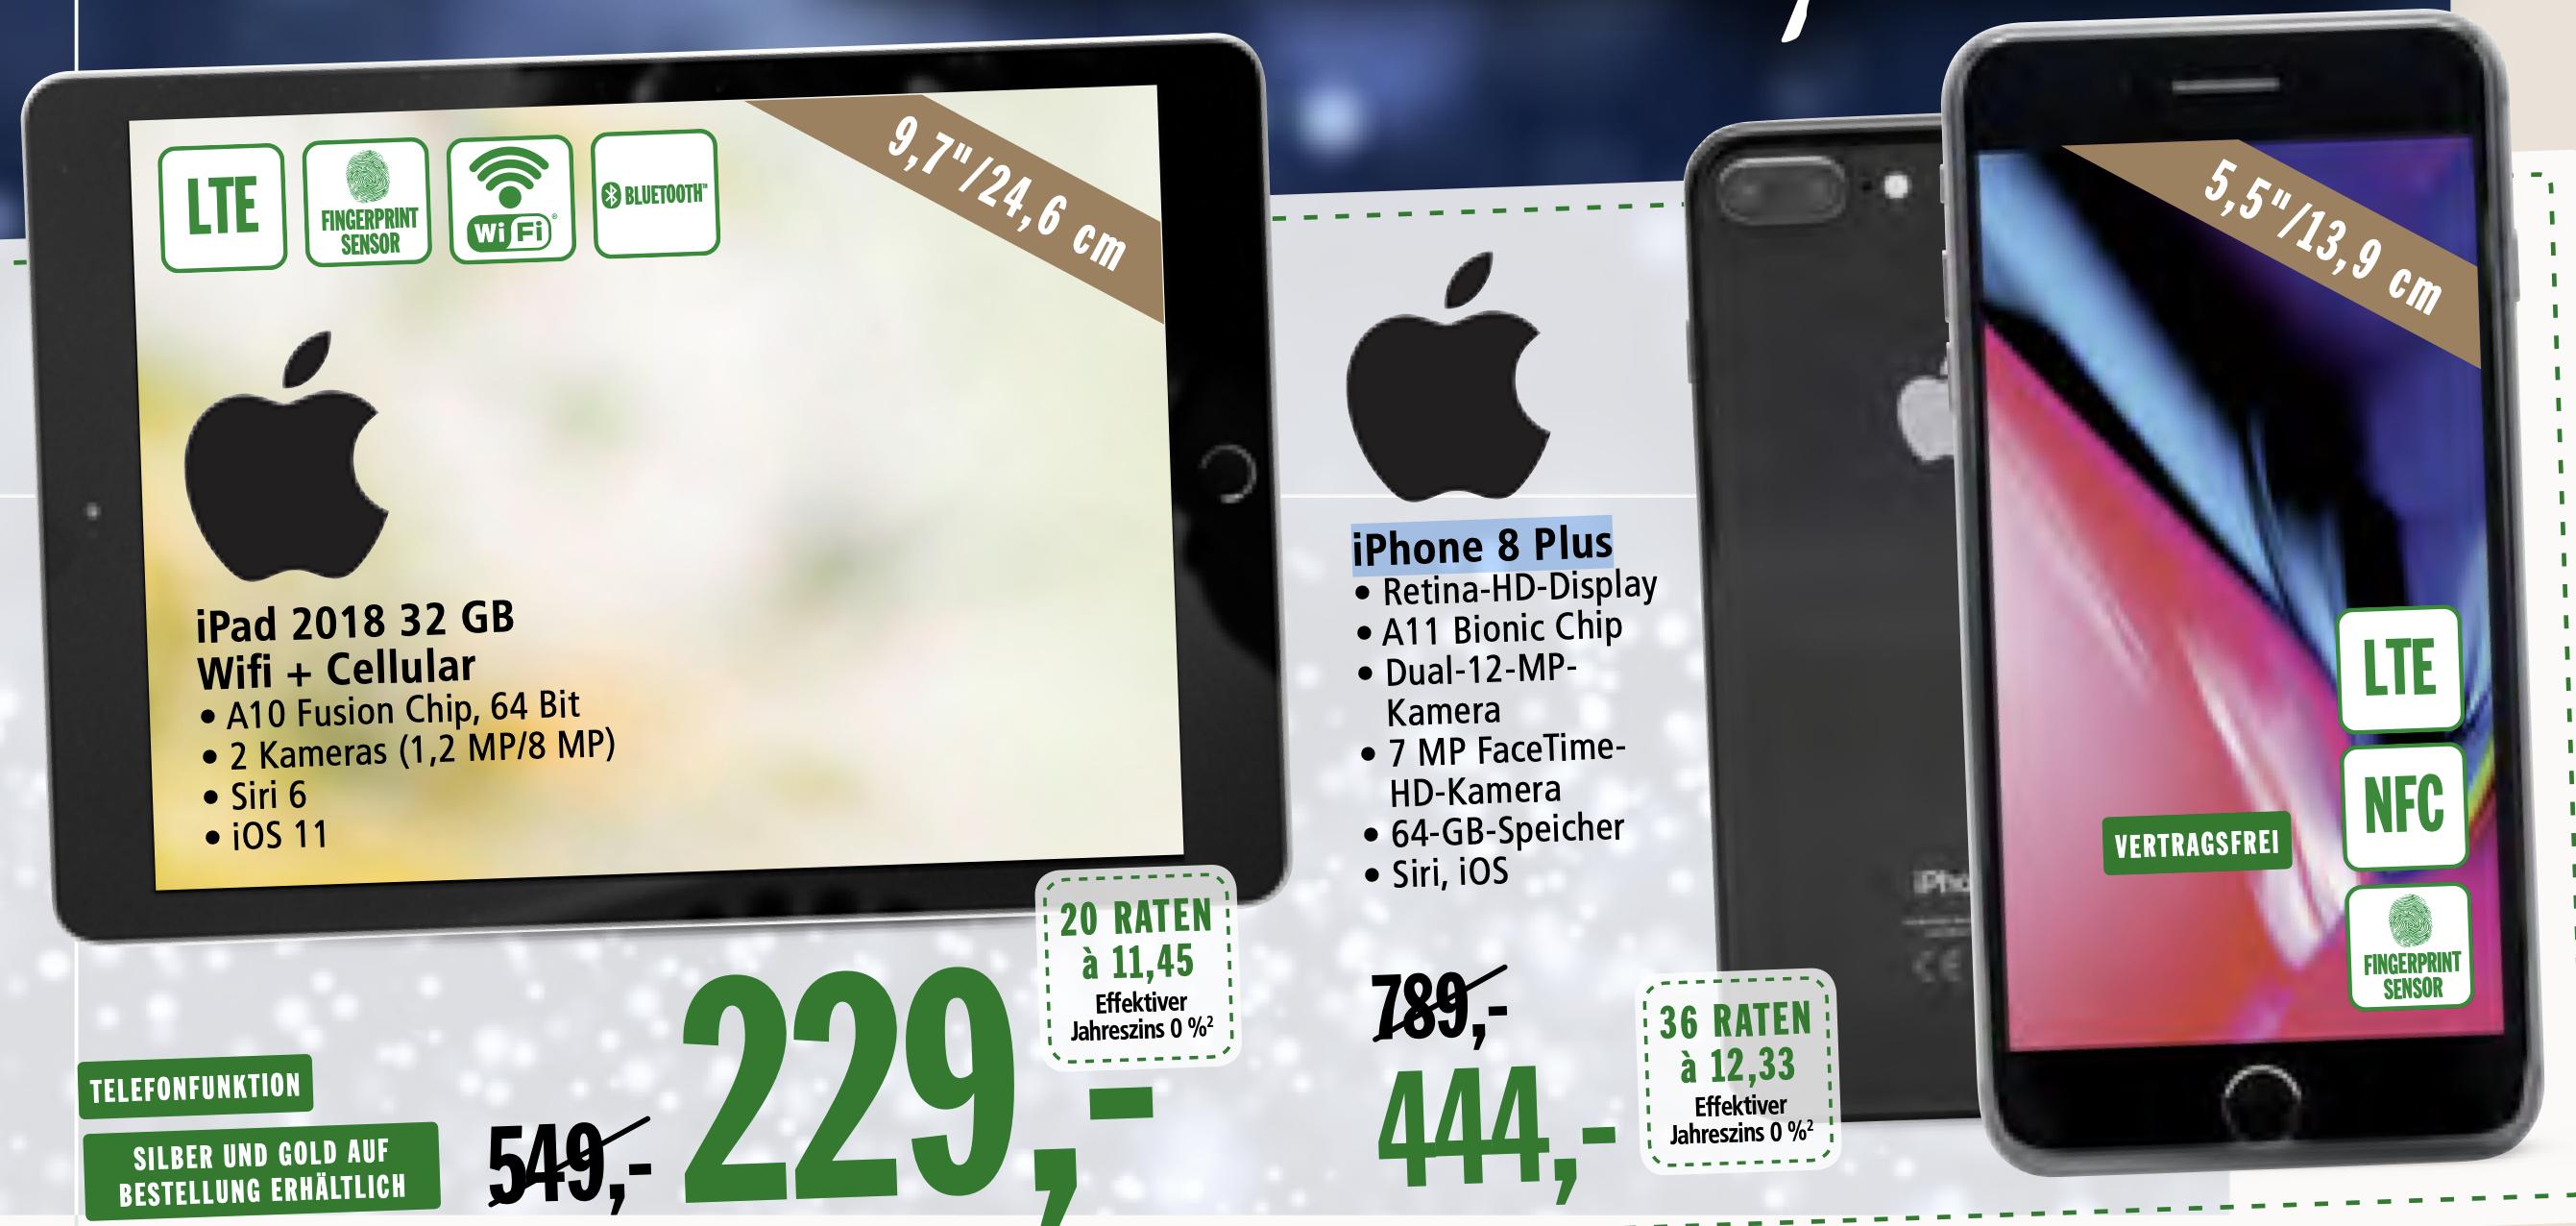 iPad 2018 WiFi/4G 32 GB Lokal: Real Neueröffnung Aschaffenburg  (sodastream 88 €, iPhone 8 Plus 444€)